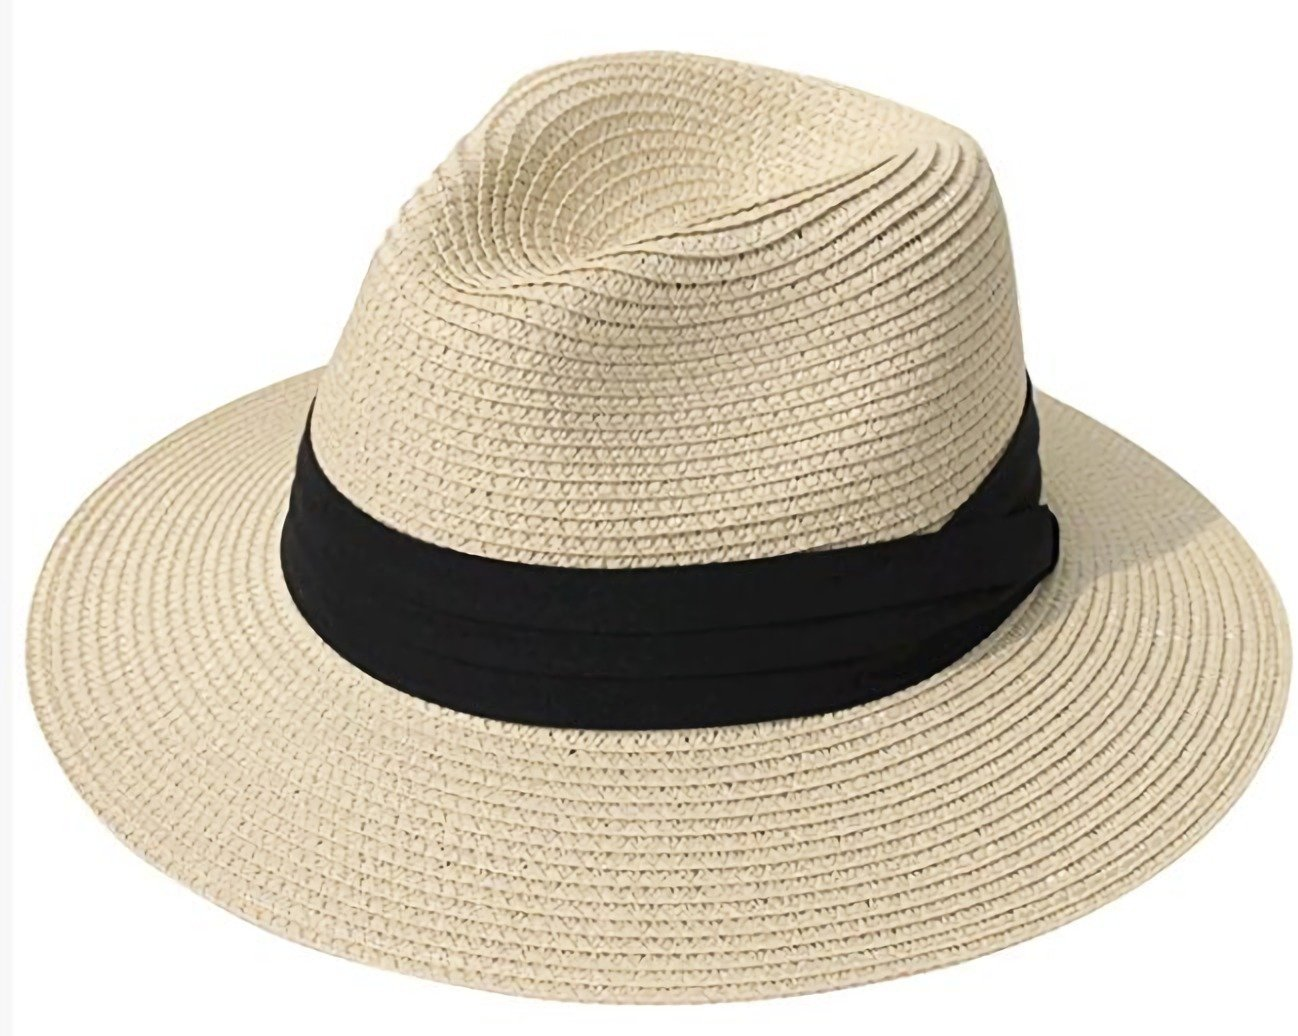 AIFUSI Women Panama Fedora Foldable Brim Summer Sun Hat Beach Cap Wide Brim Straw Hats